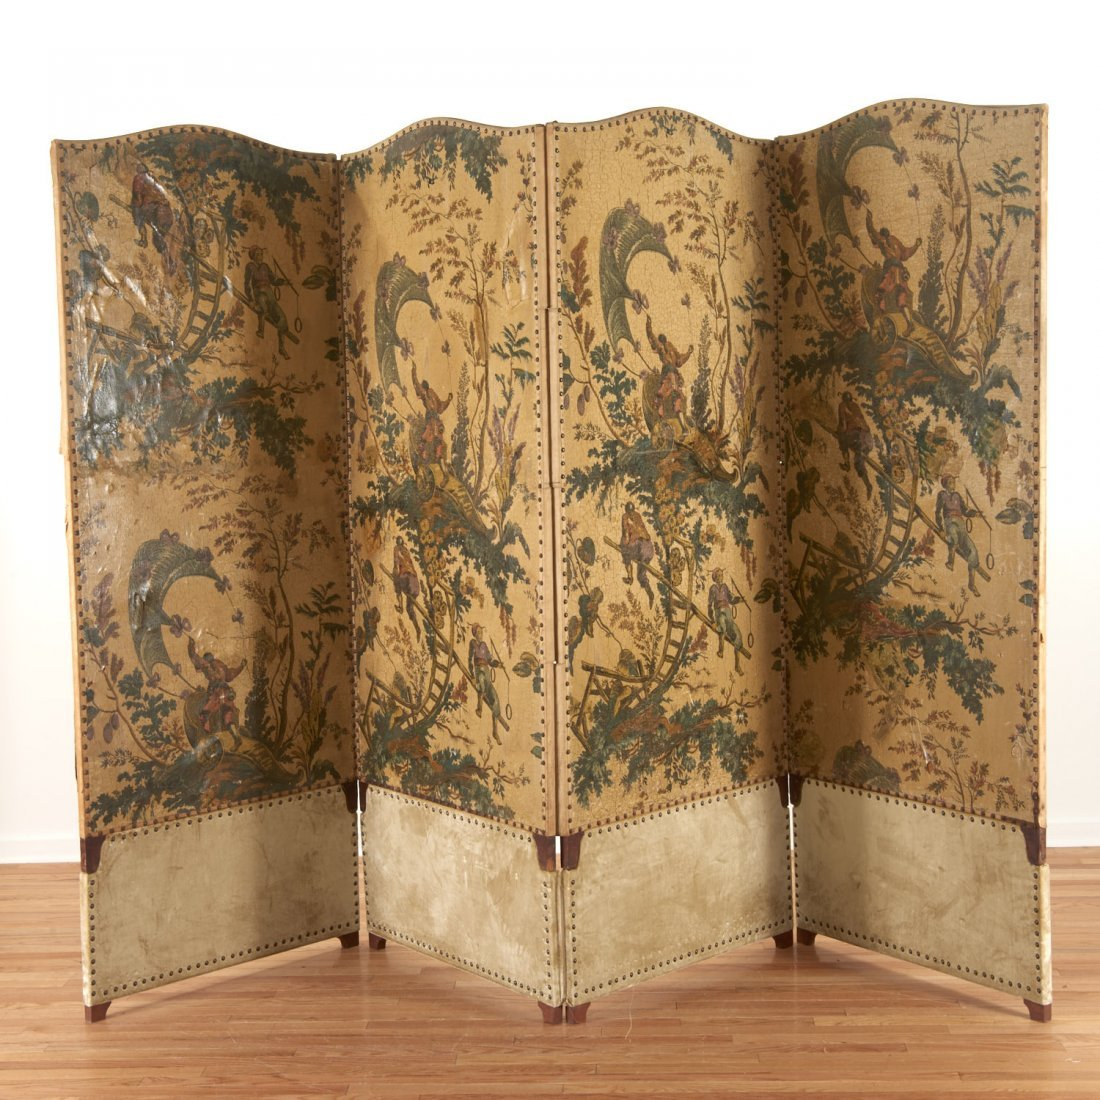 Flemish Chinoiserie hand-painted 4-panel screen